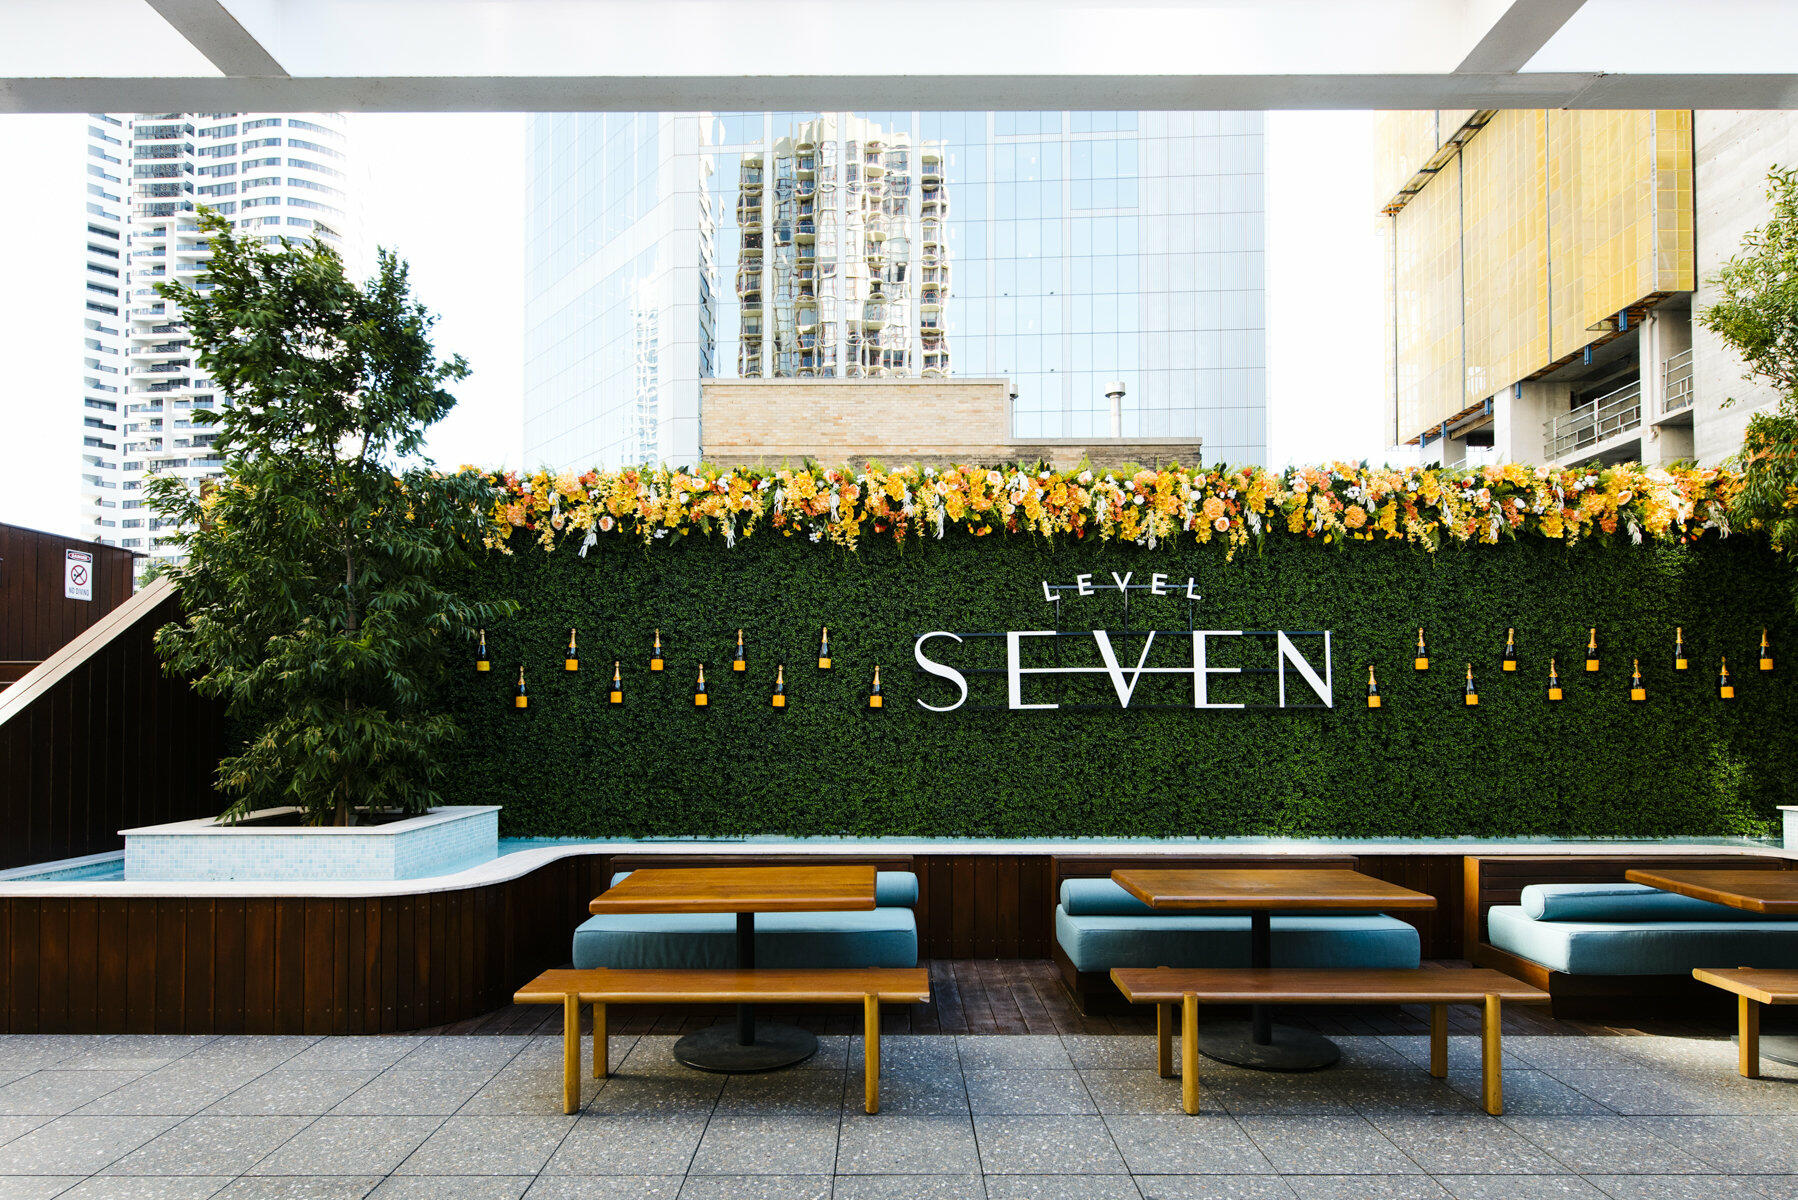 Primus Hotel Sydney Level Seven Restaurant